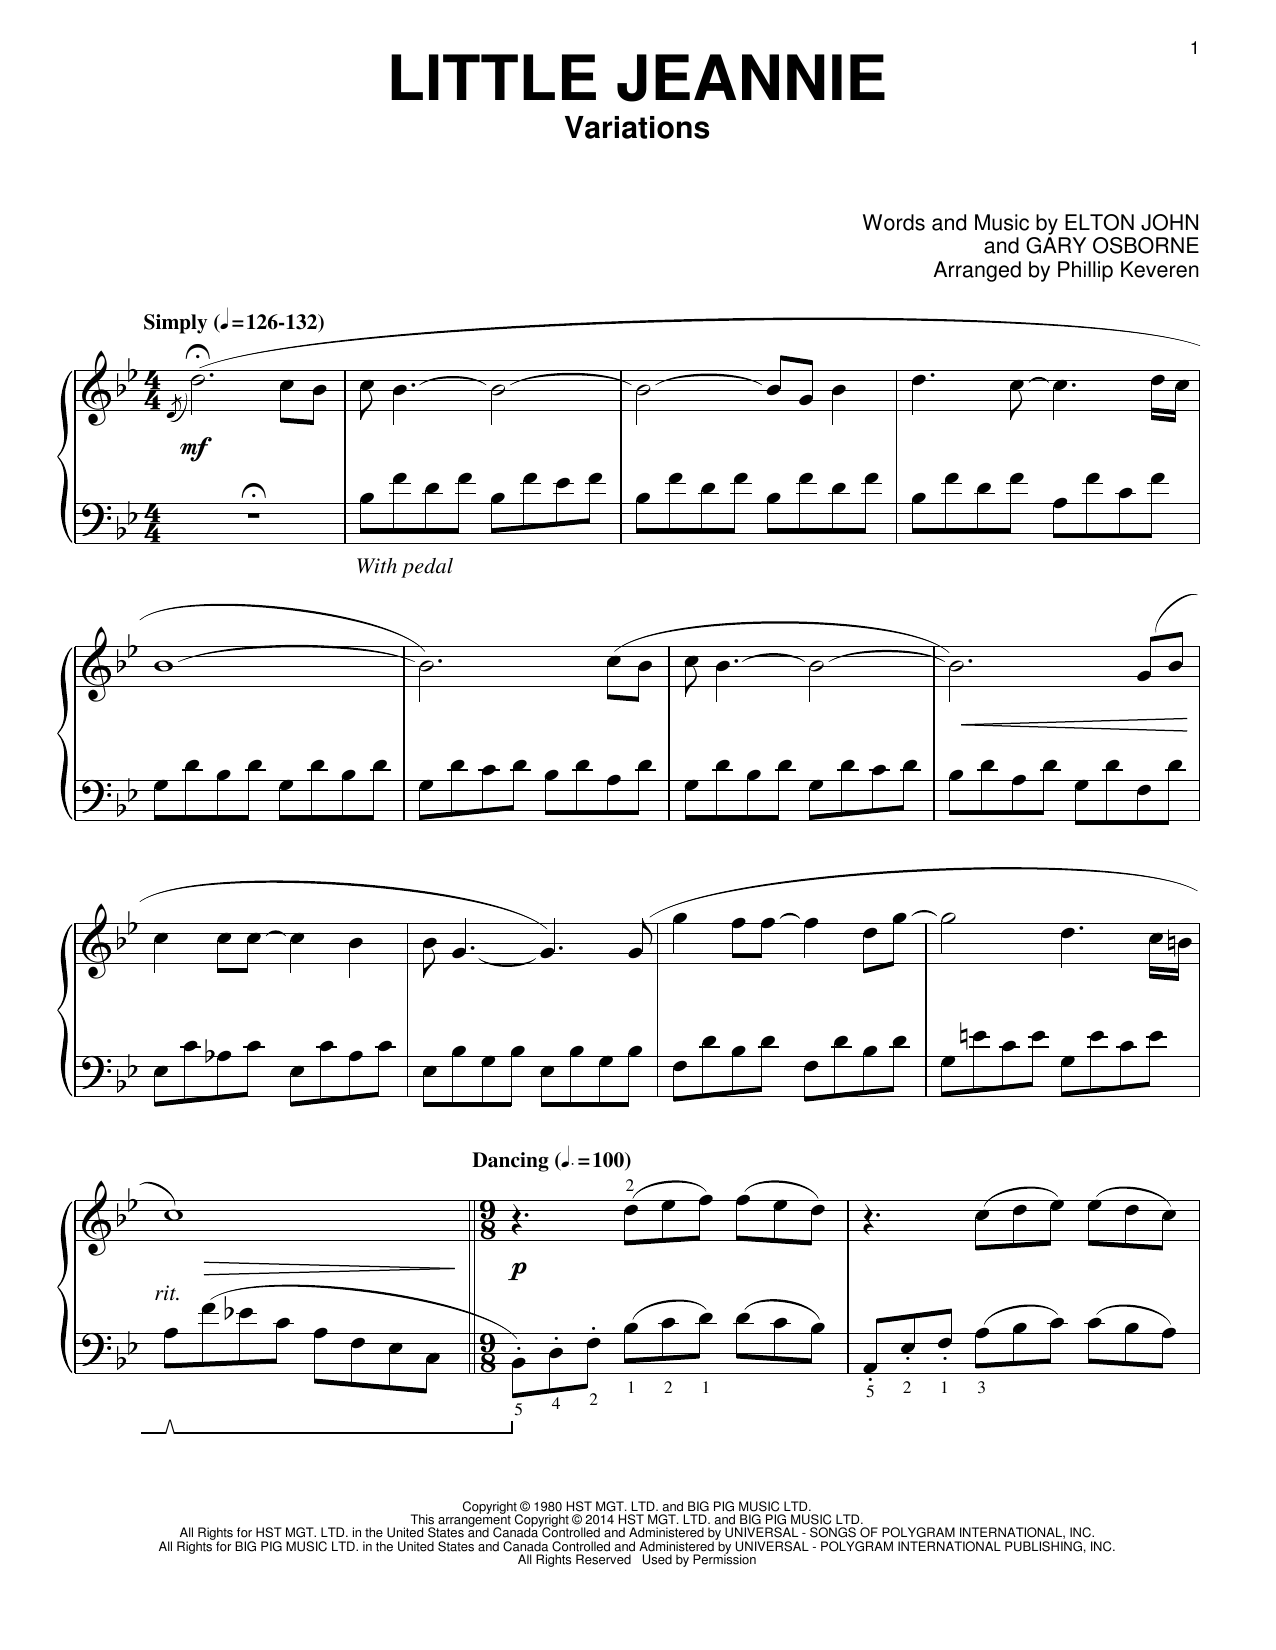 Elton John Little Jeannie [Classical version] (arr. Phillip Keveren) sheet music notes and chords. Download Printable PDF.